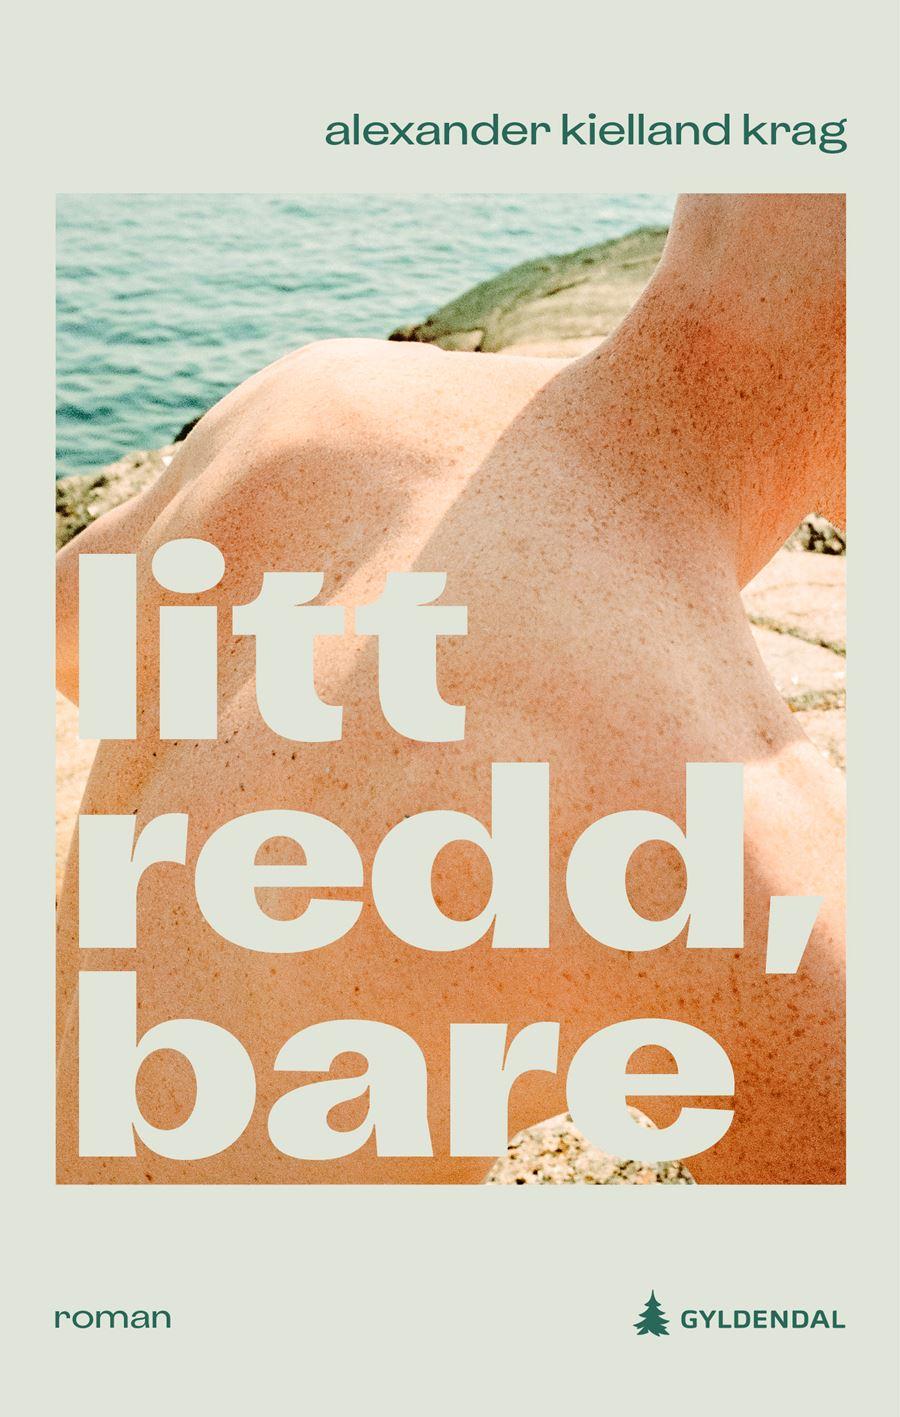 Alexander Kielland Krag's new book Litt Redd, Bare